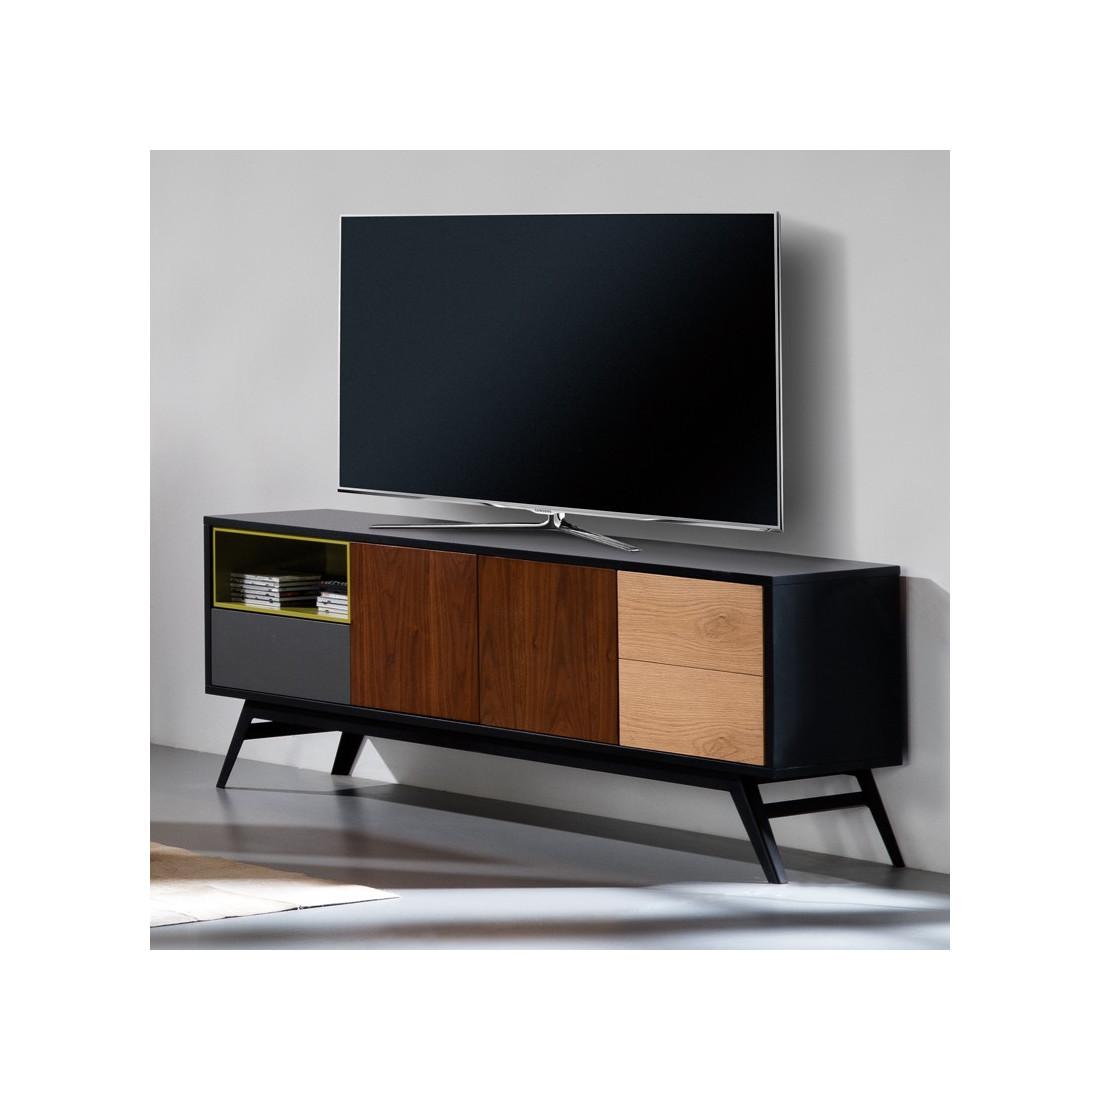 meuble tv 3 portes 1 tiroir scandinave alesia n 2 univers du salon. Black Bedroom Furniture Sets. Home Design Ideas